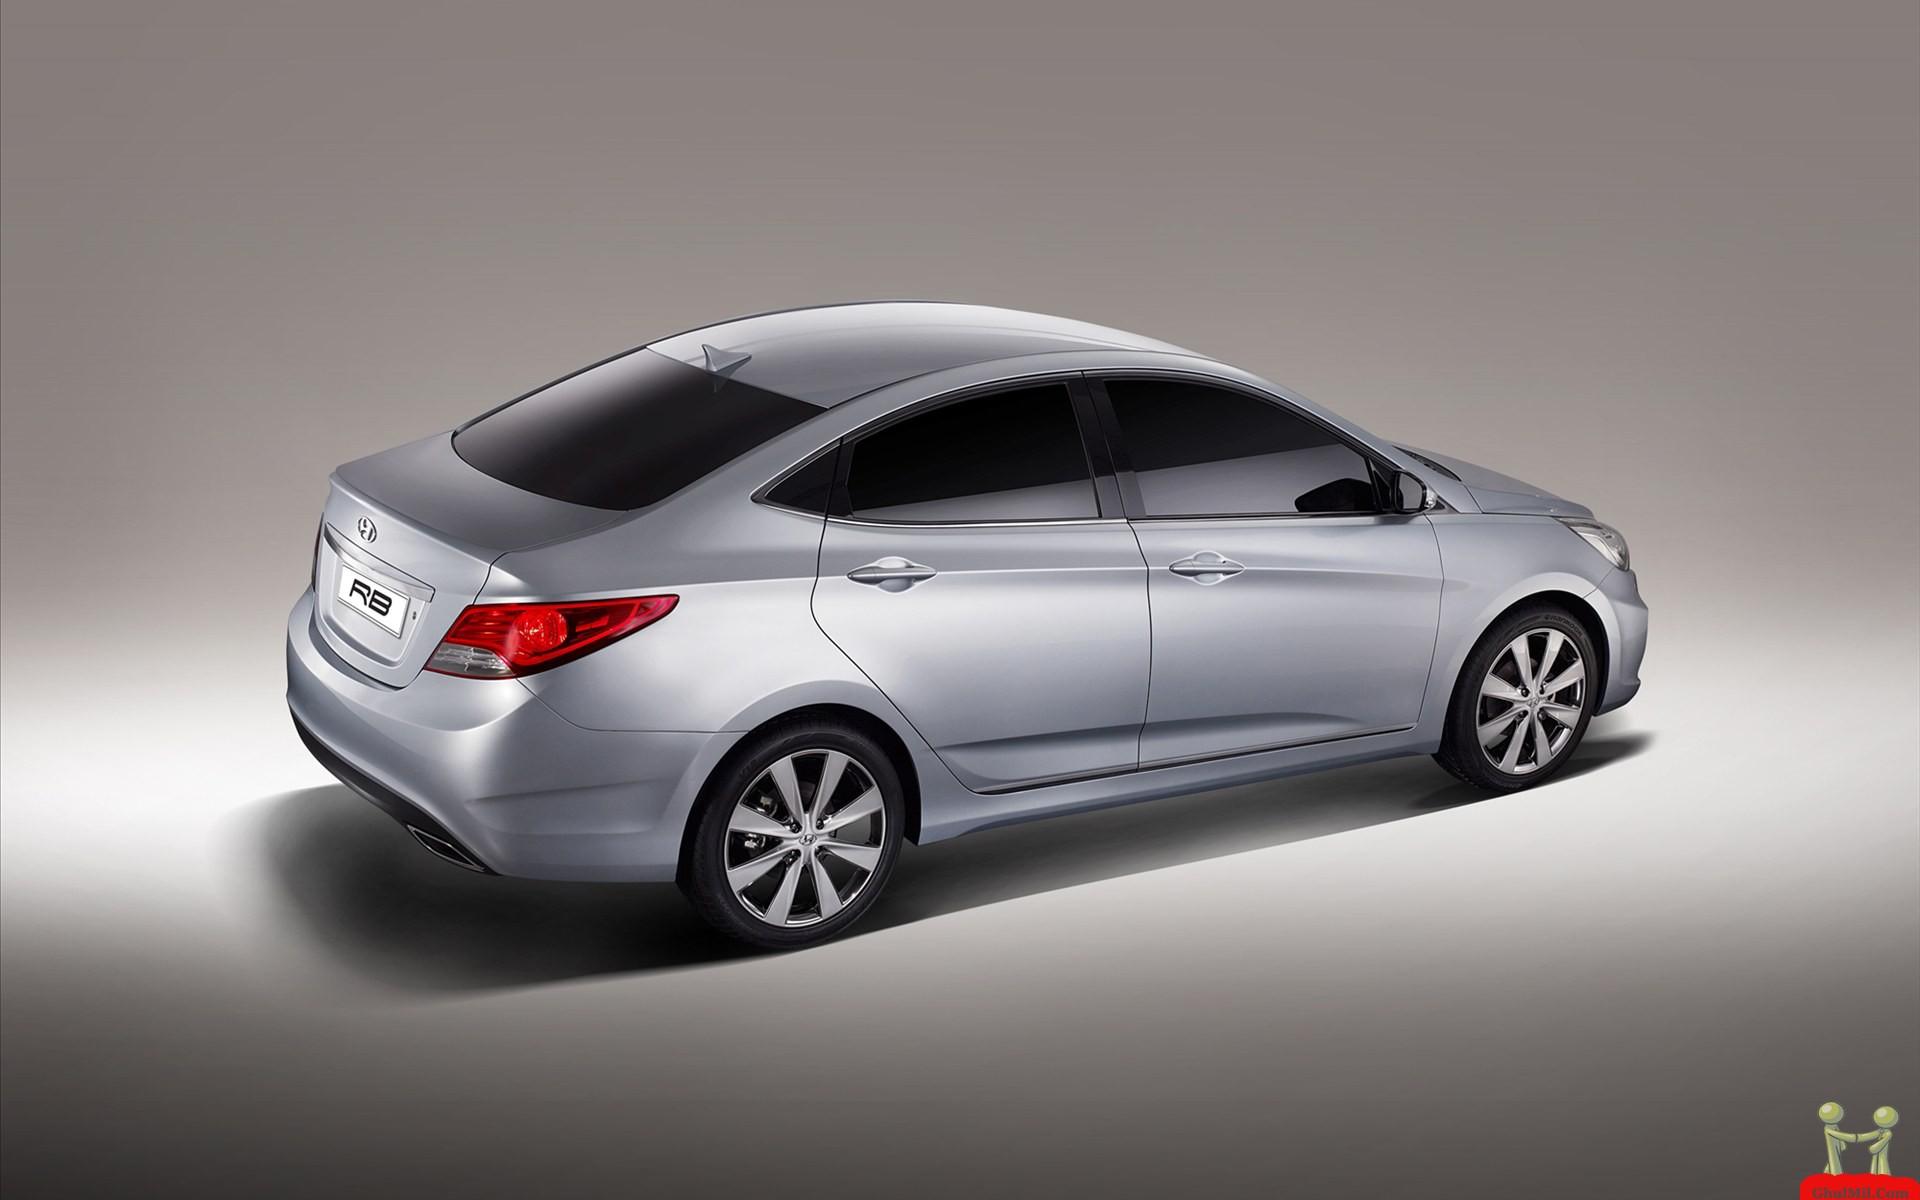 Hyundai Cars 39 Background - HD Wallpaper Car